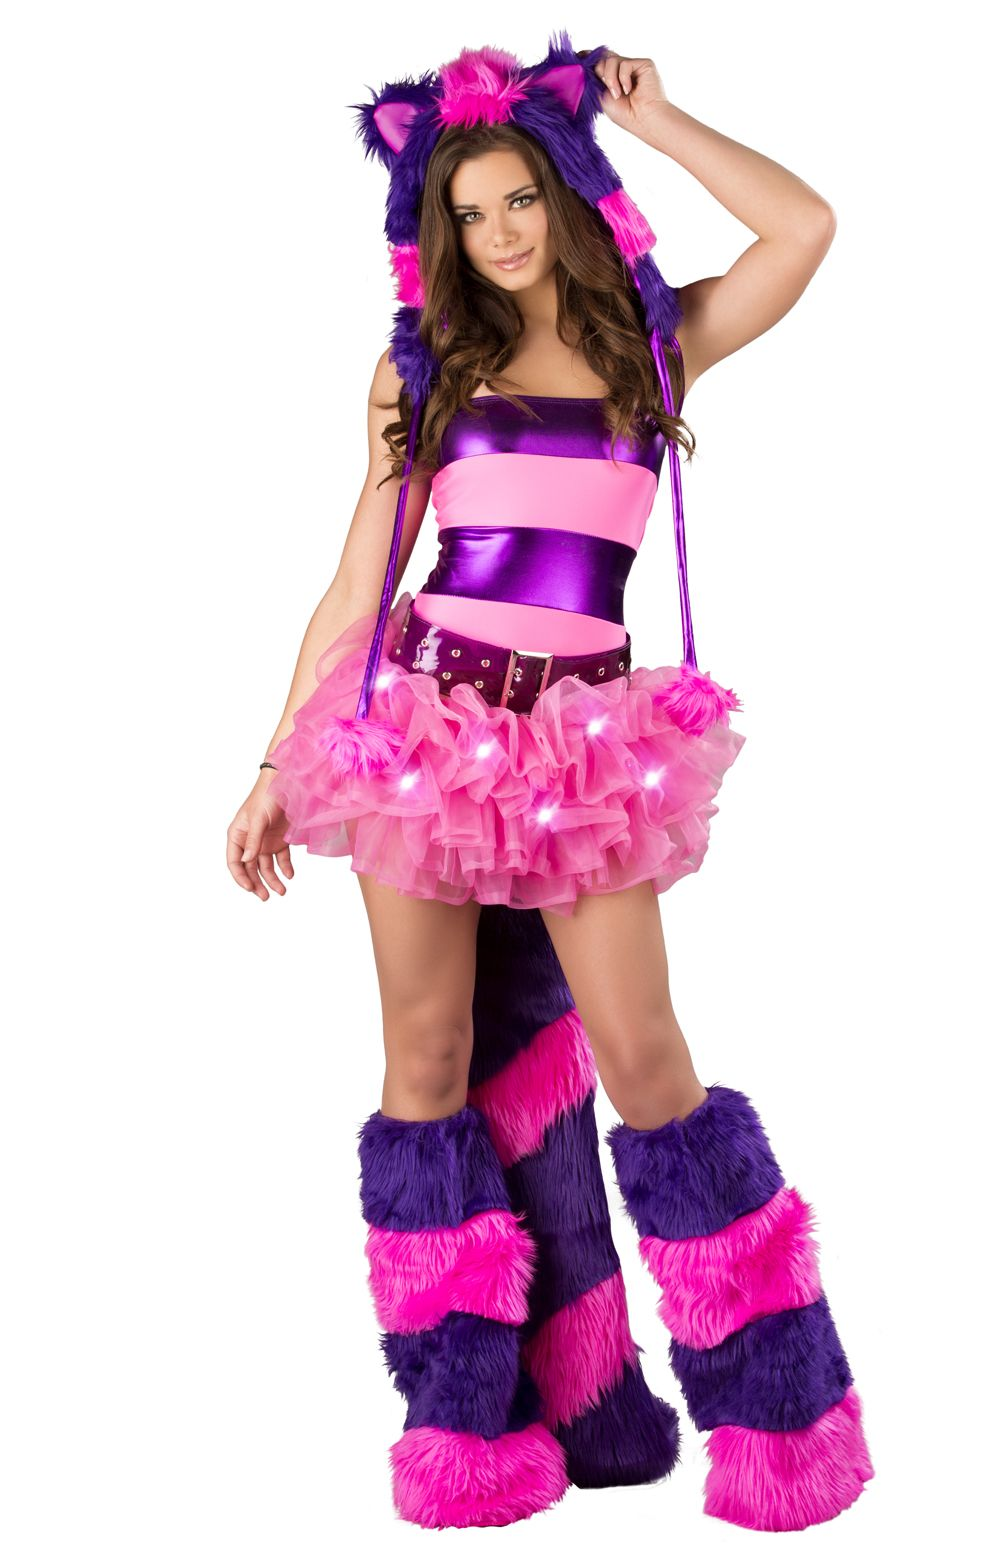 Cheshire Cat Tutu Costume By J Valentine | Light Up Cat Costume, J Valentine  Cheshire